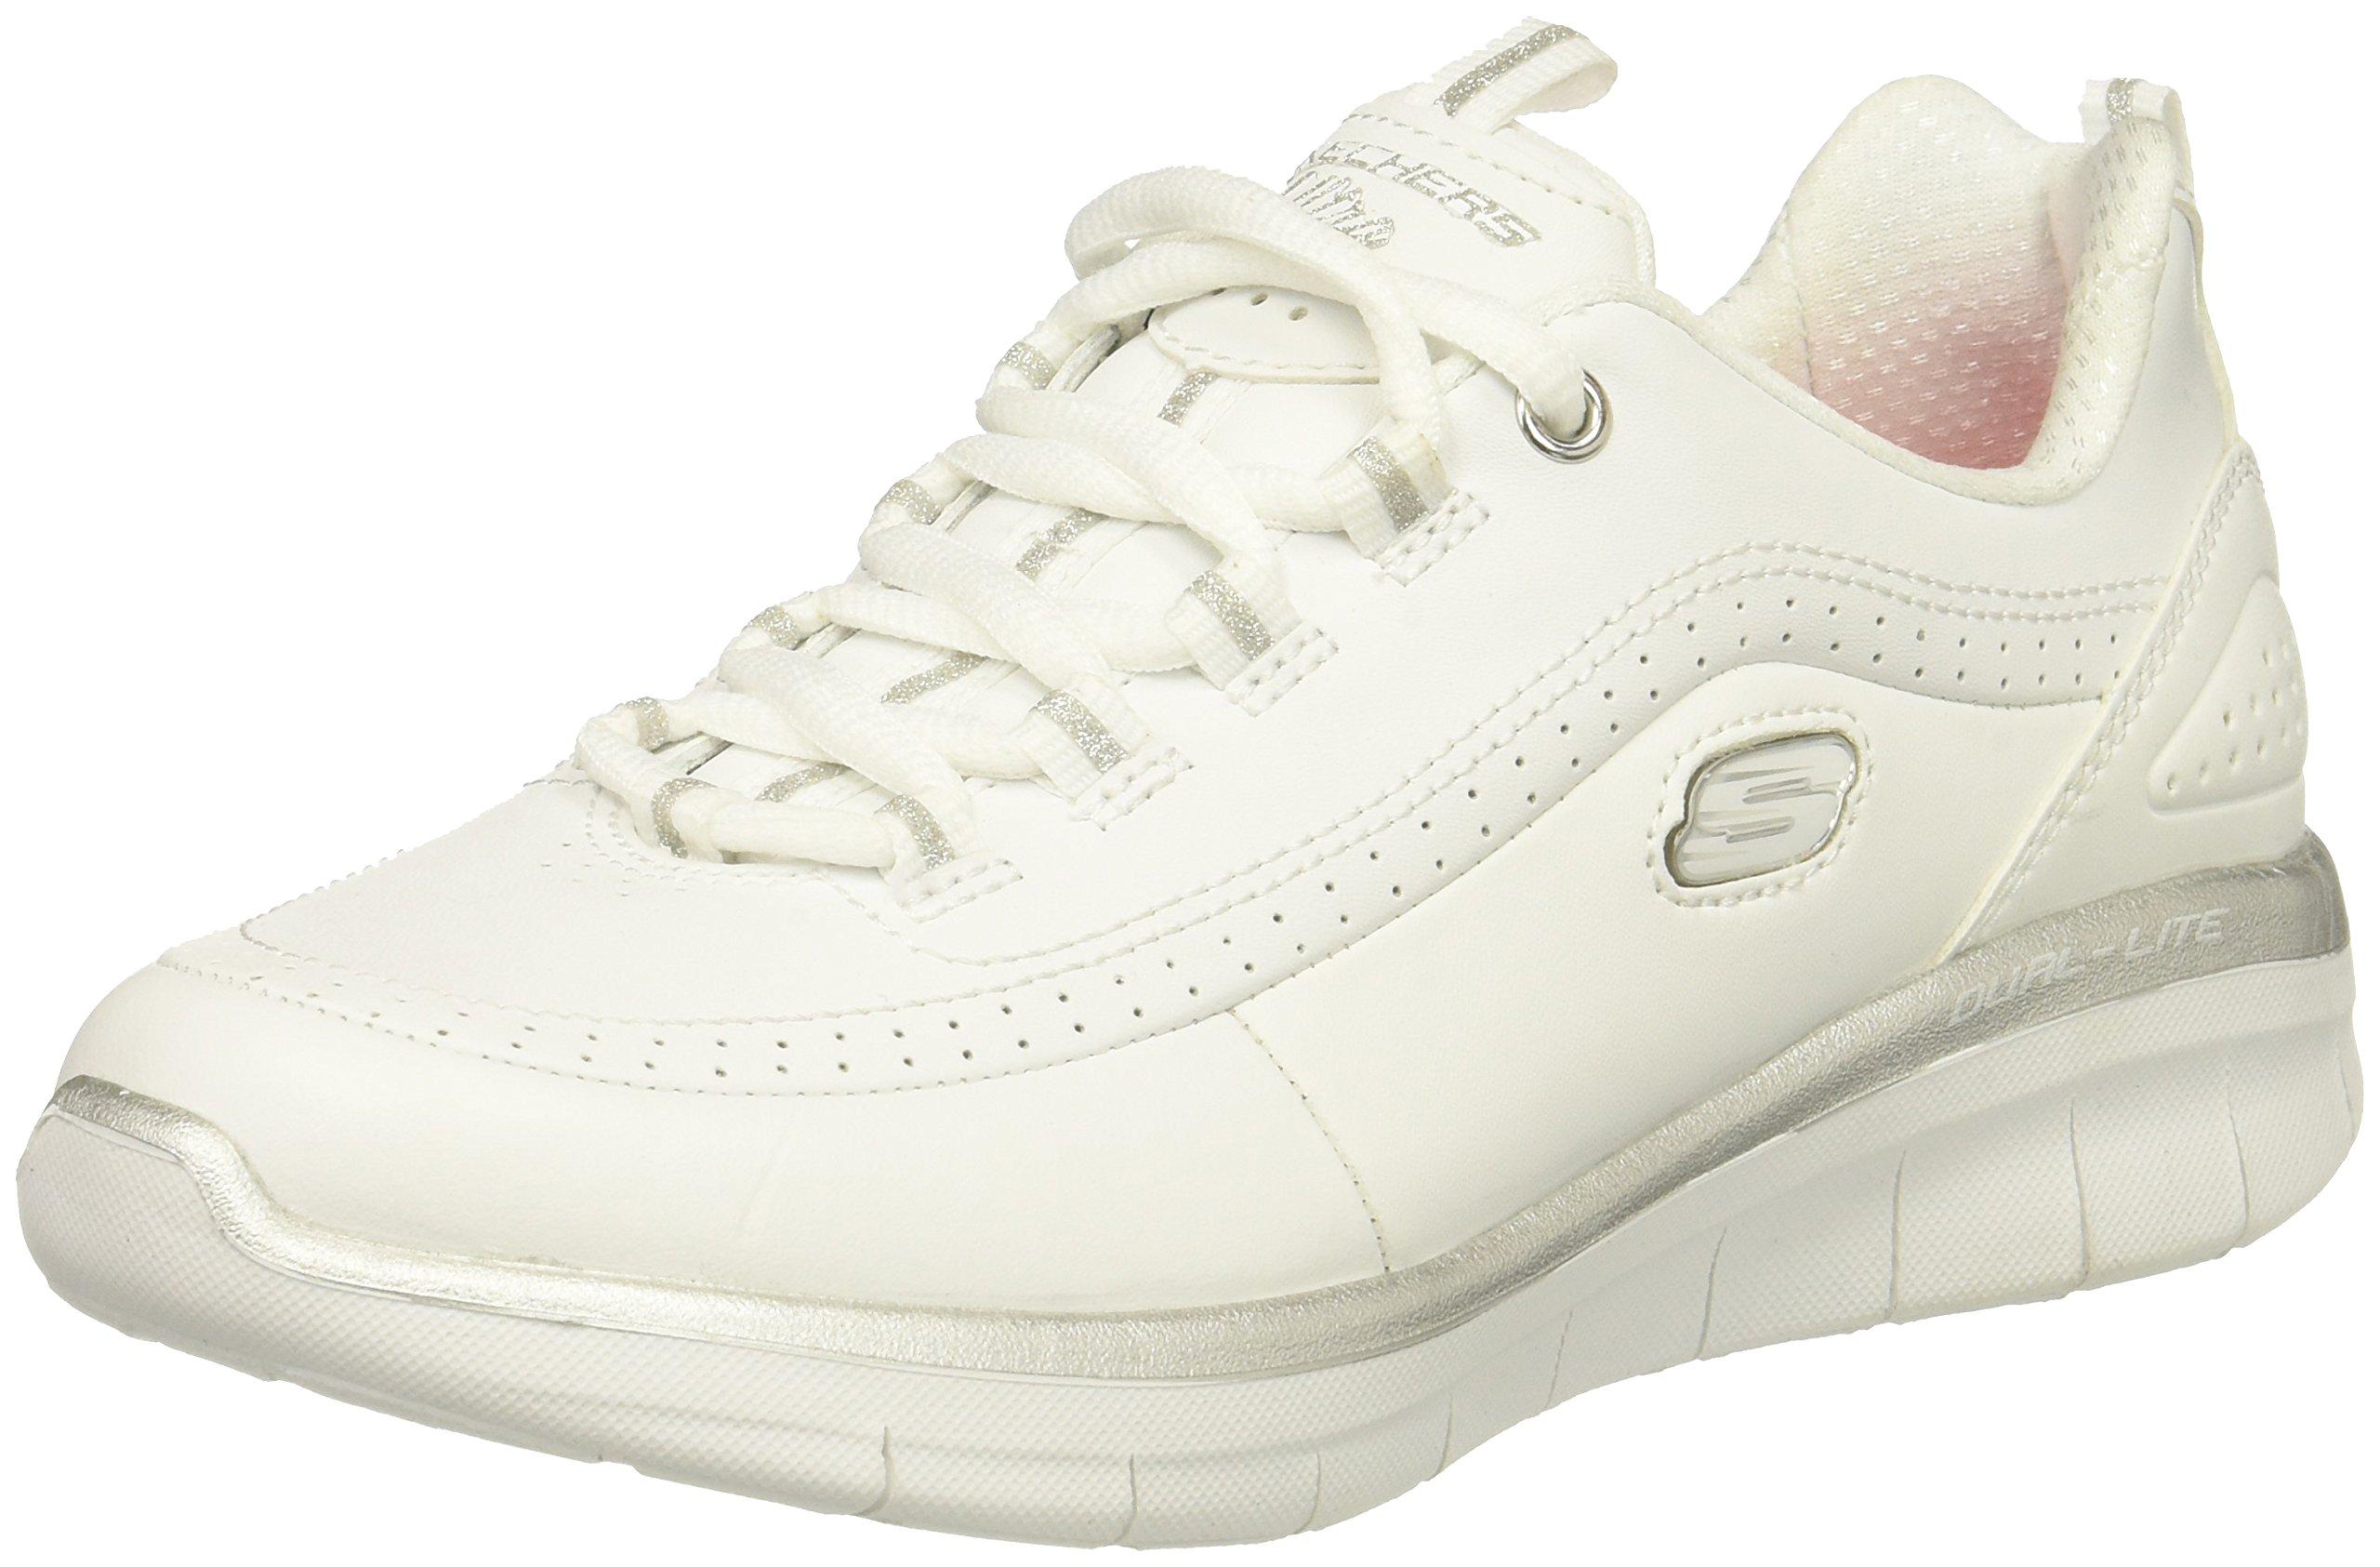 Skechers Sport Women's Synergy 2.0 Fashion Sneaker, White/Silver, 9 M US